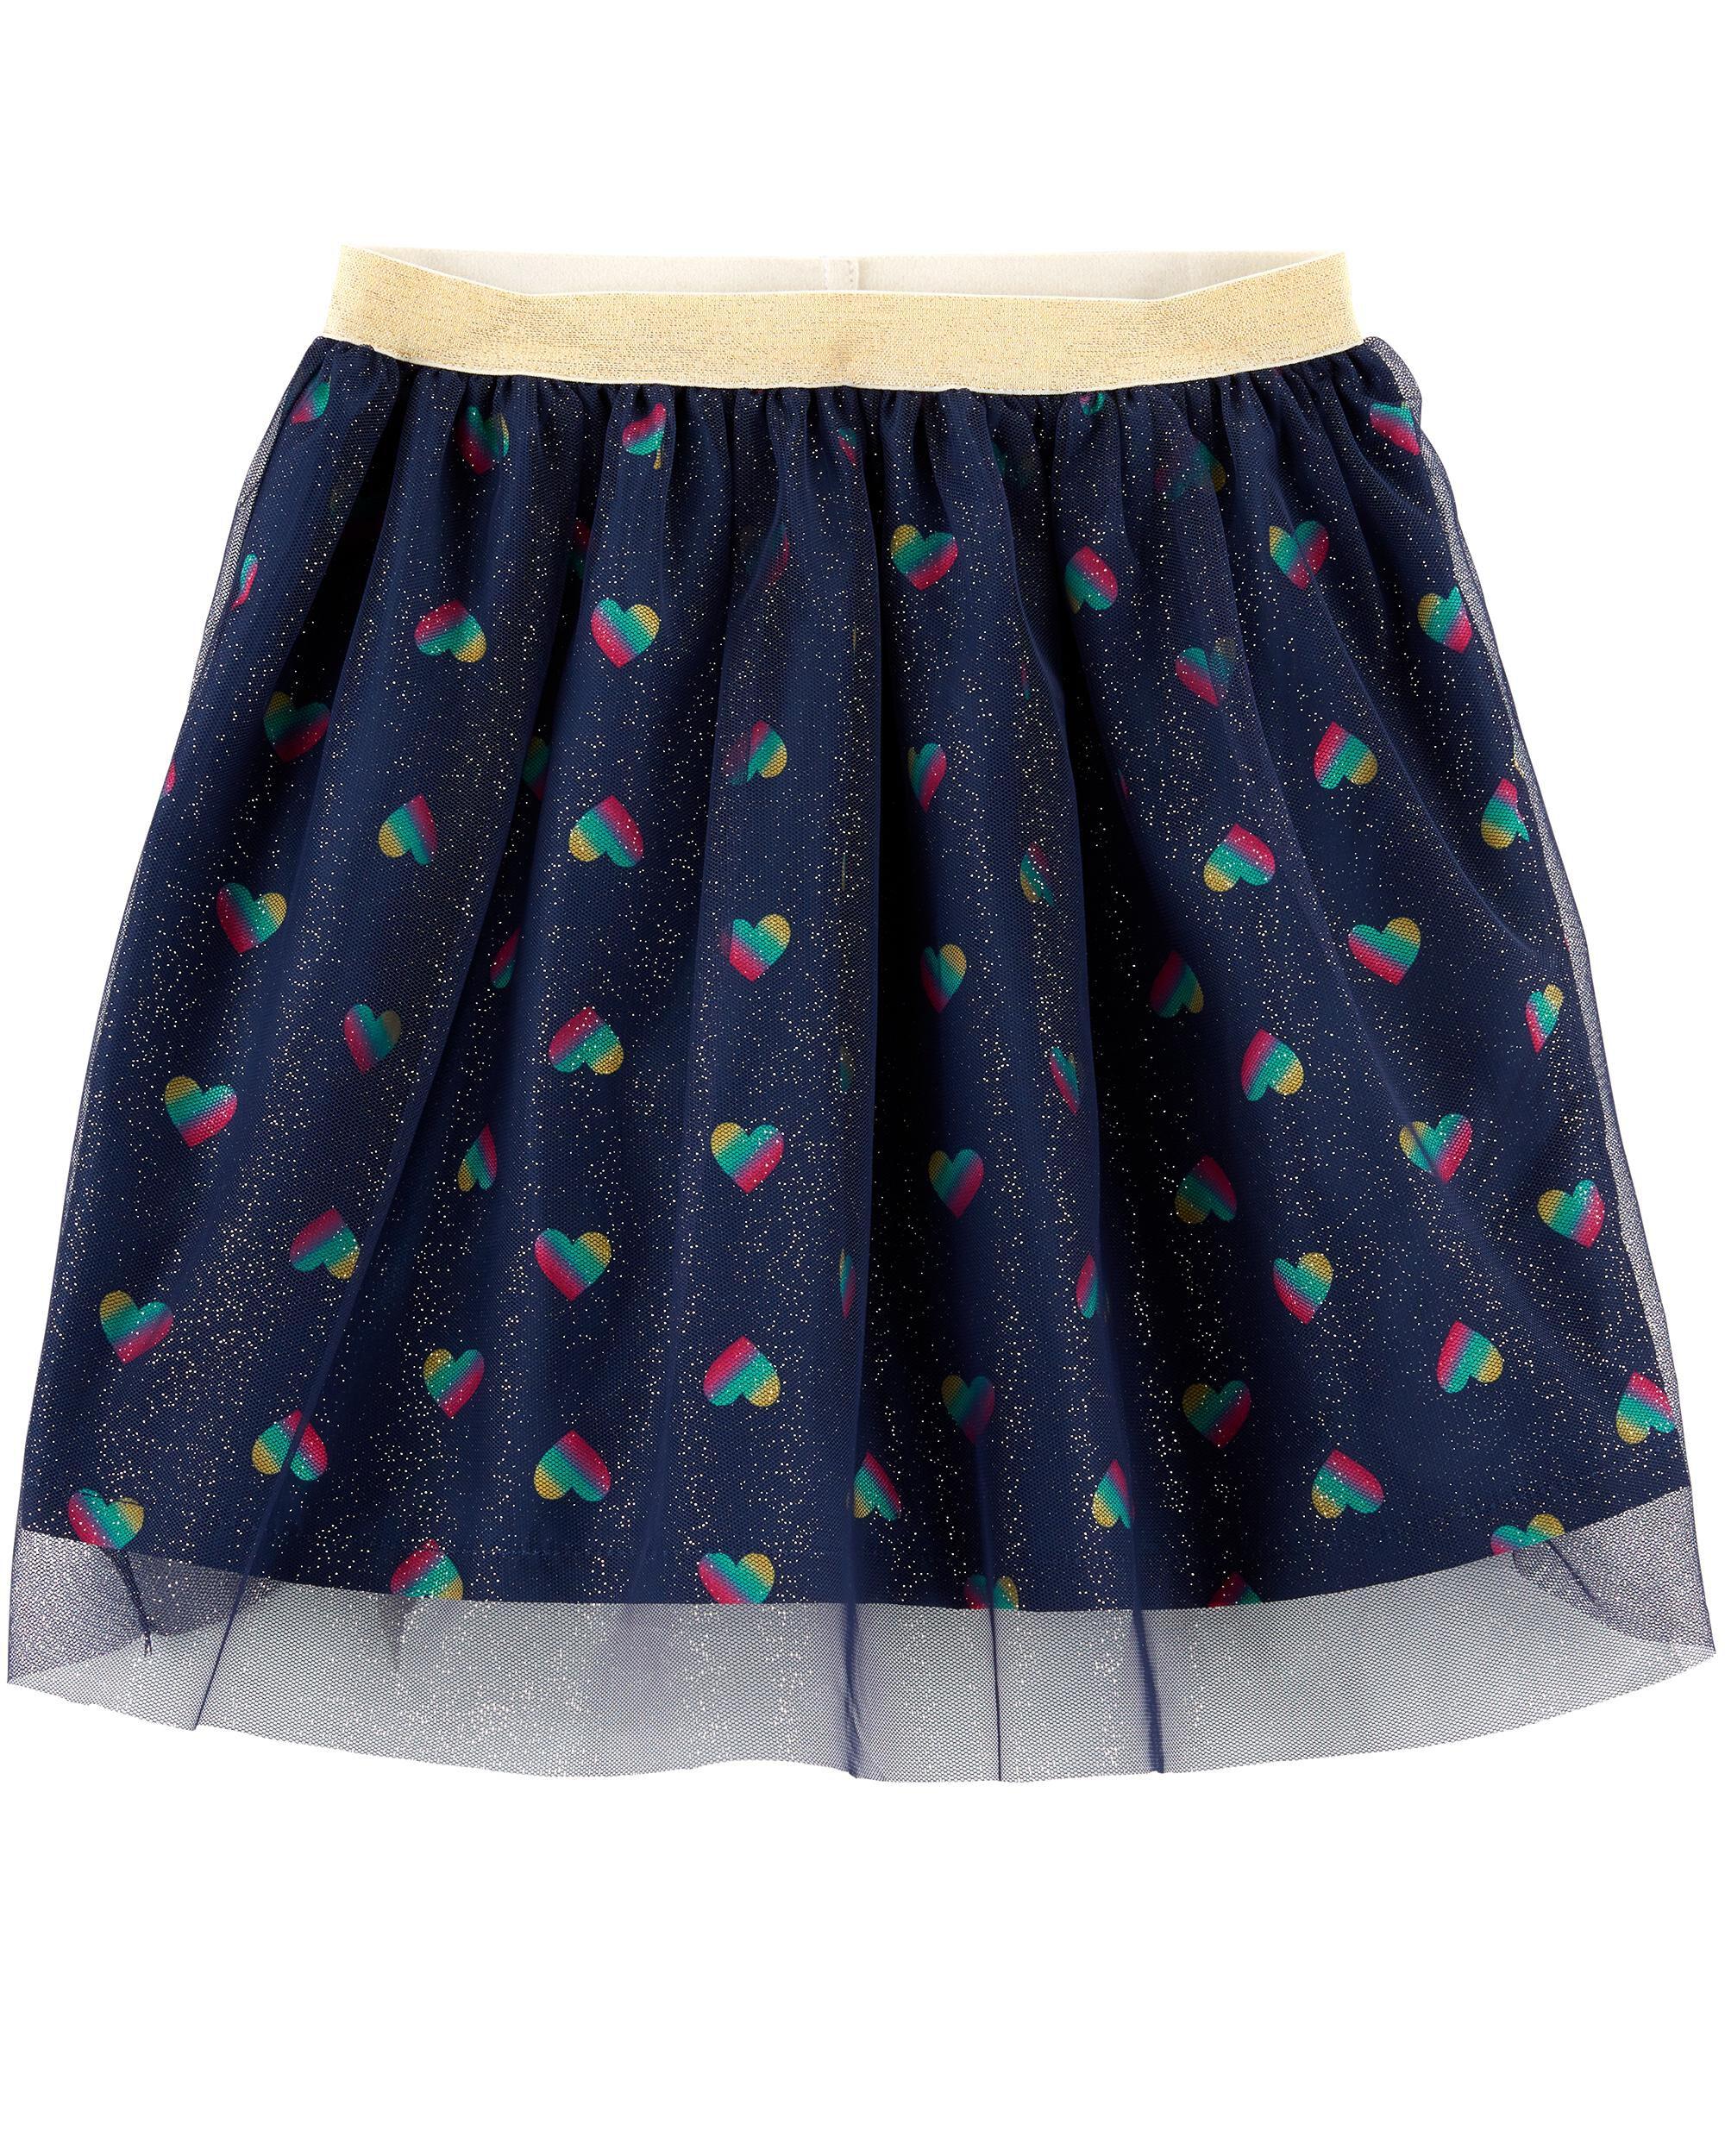 *CLEARANCE* Glitter Heart Tutu Skirt